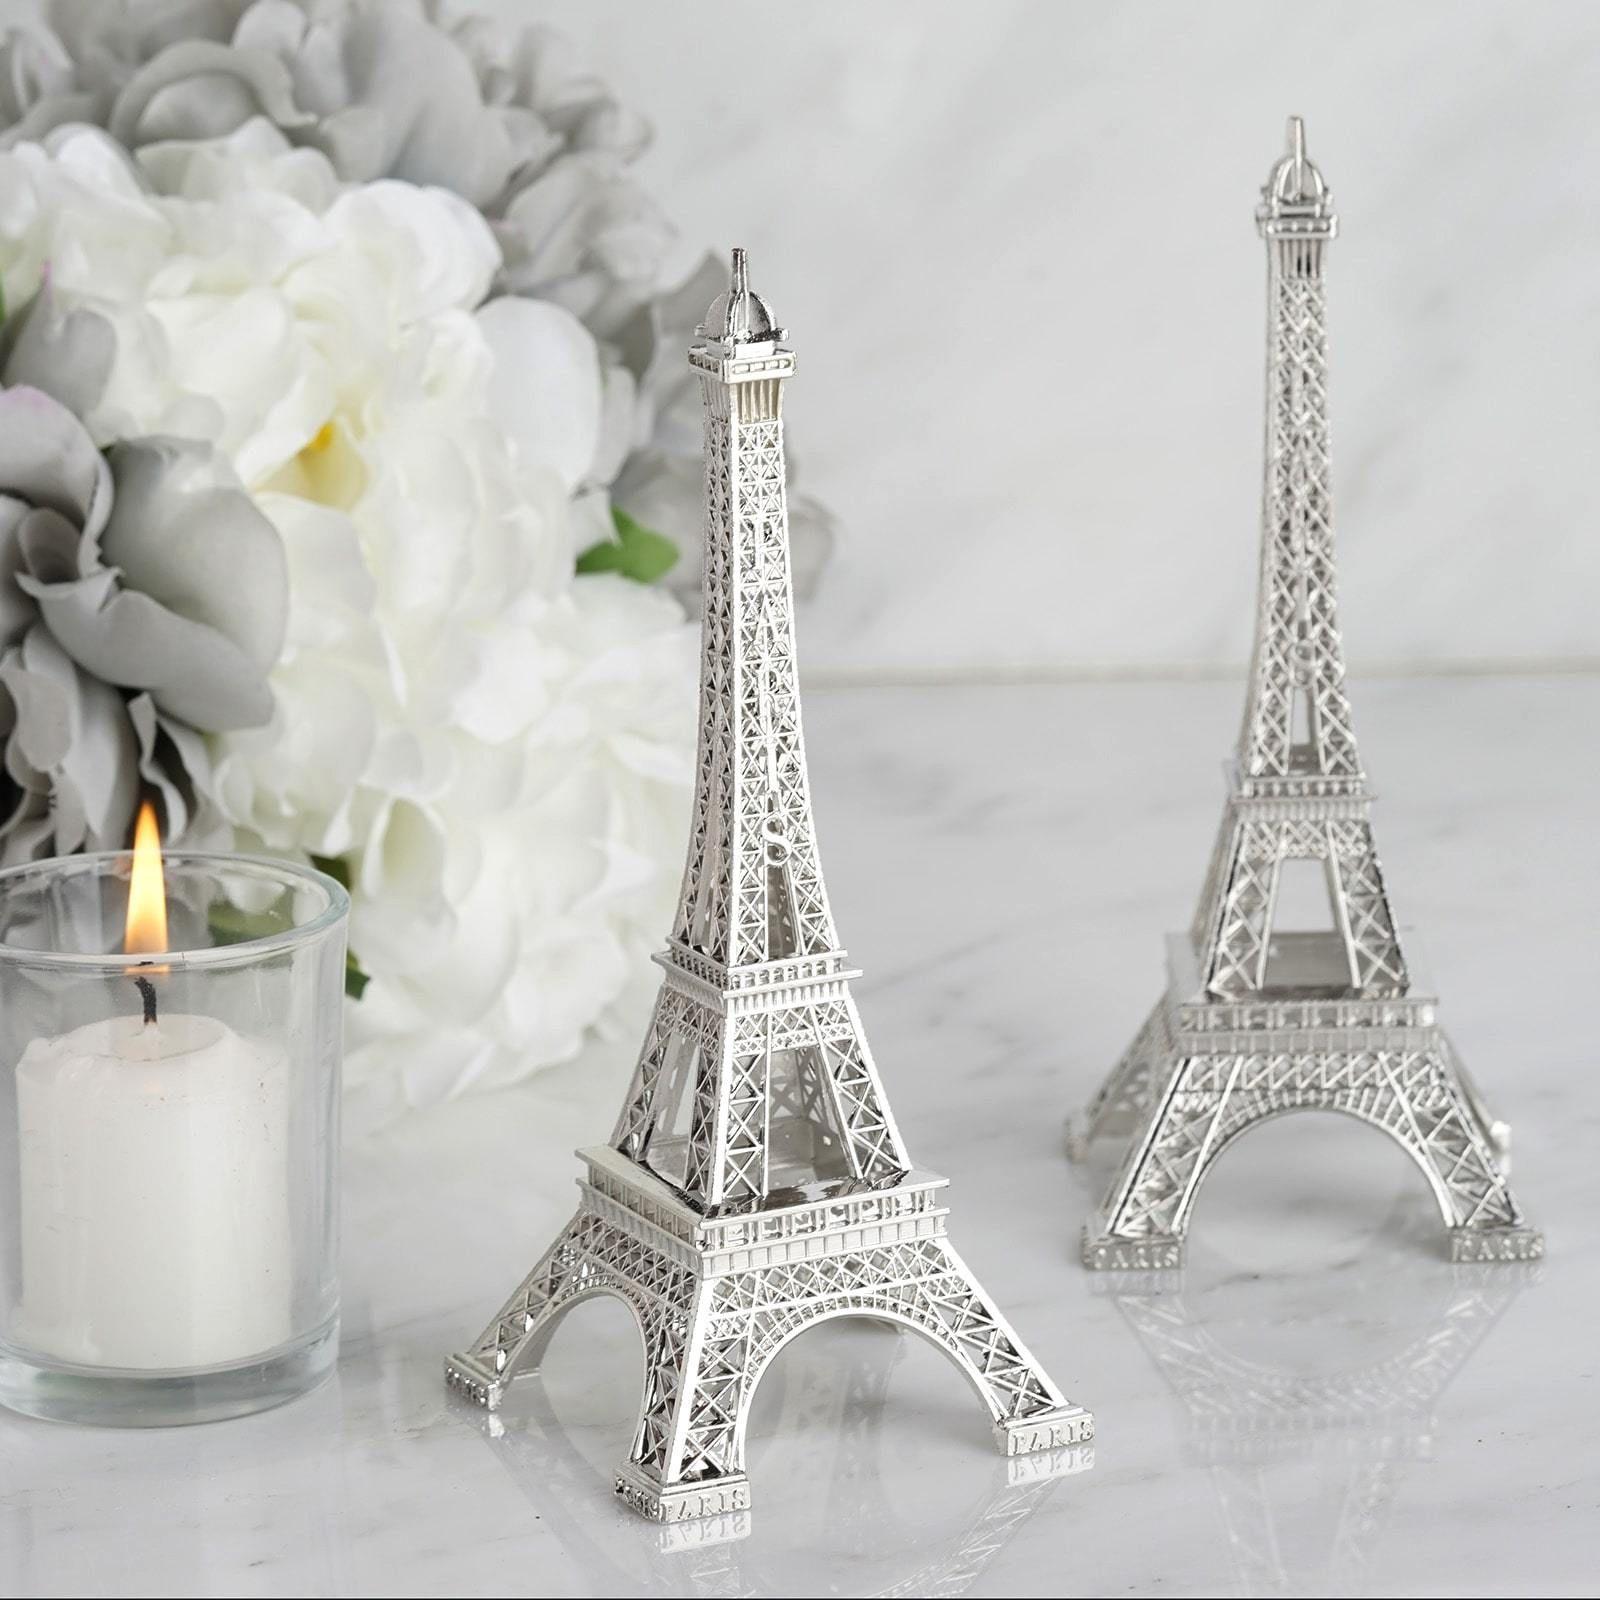 6 Silver Eiffel Tower Centerpiece Eiffel Tower Cake Topper Decorative Figurine Eiffel Tower Centerpiece Tower Centerpiece Paris Theme Centerpieces